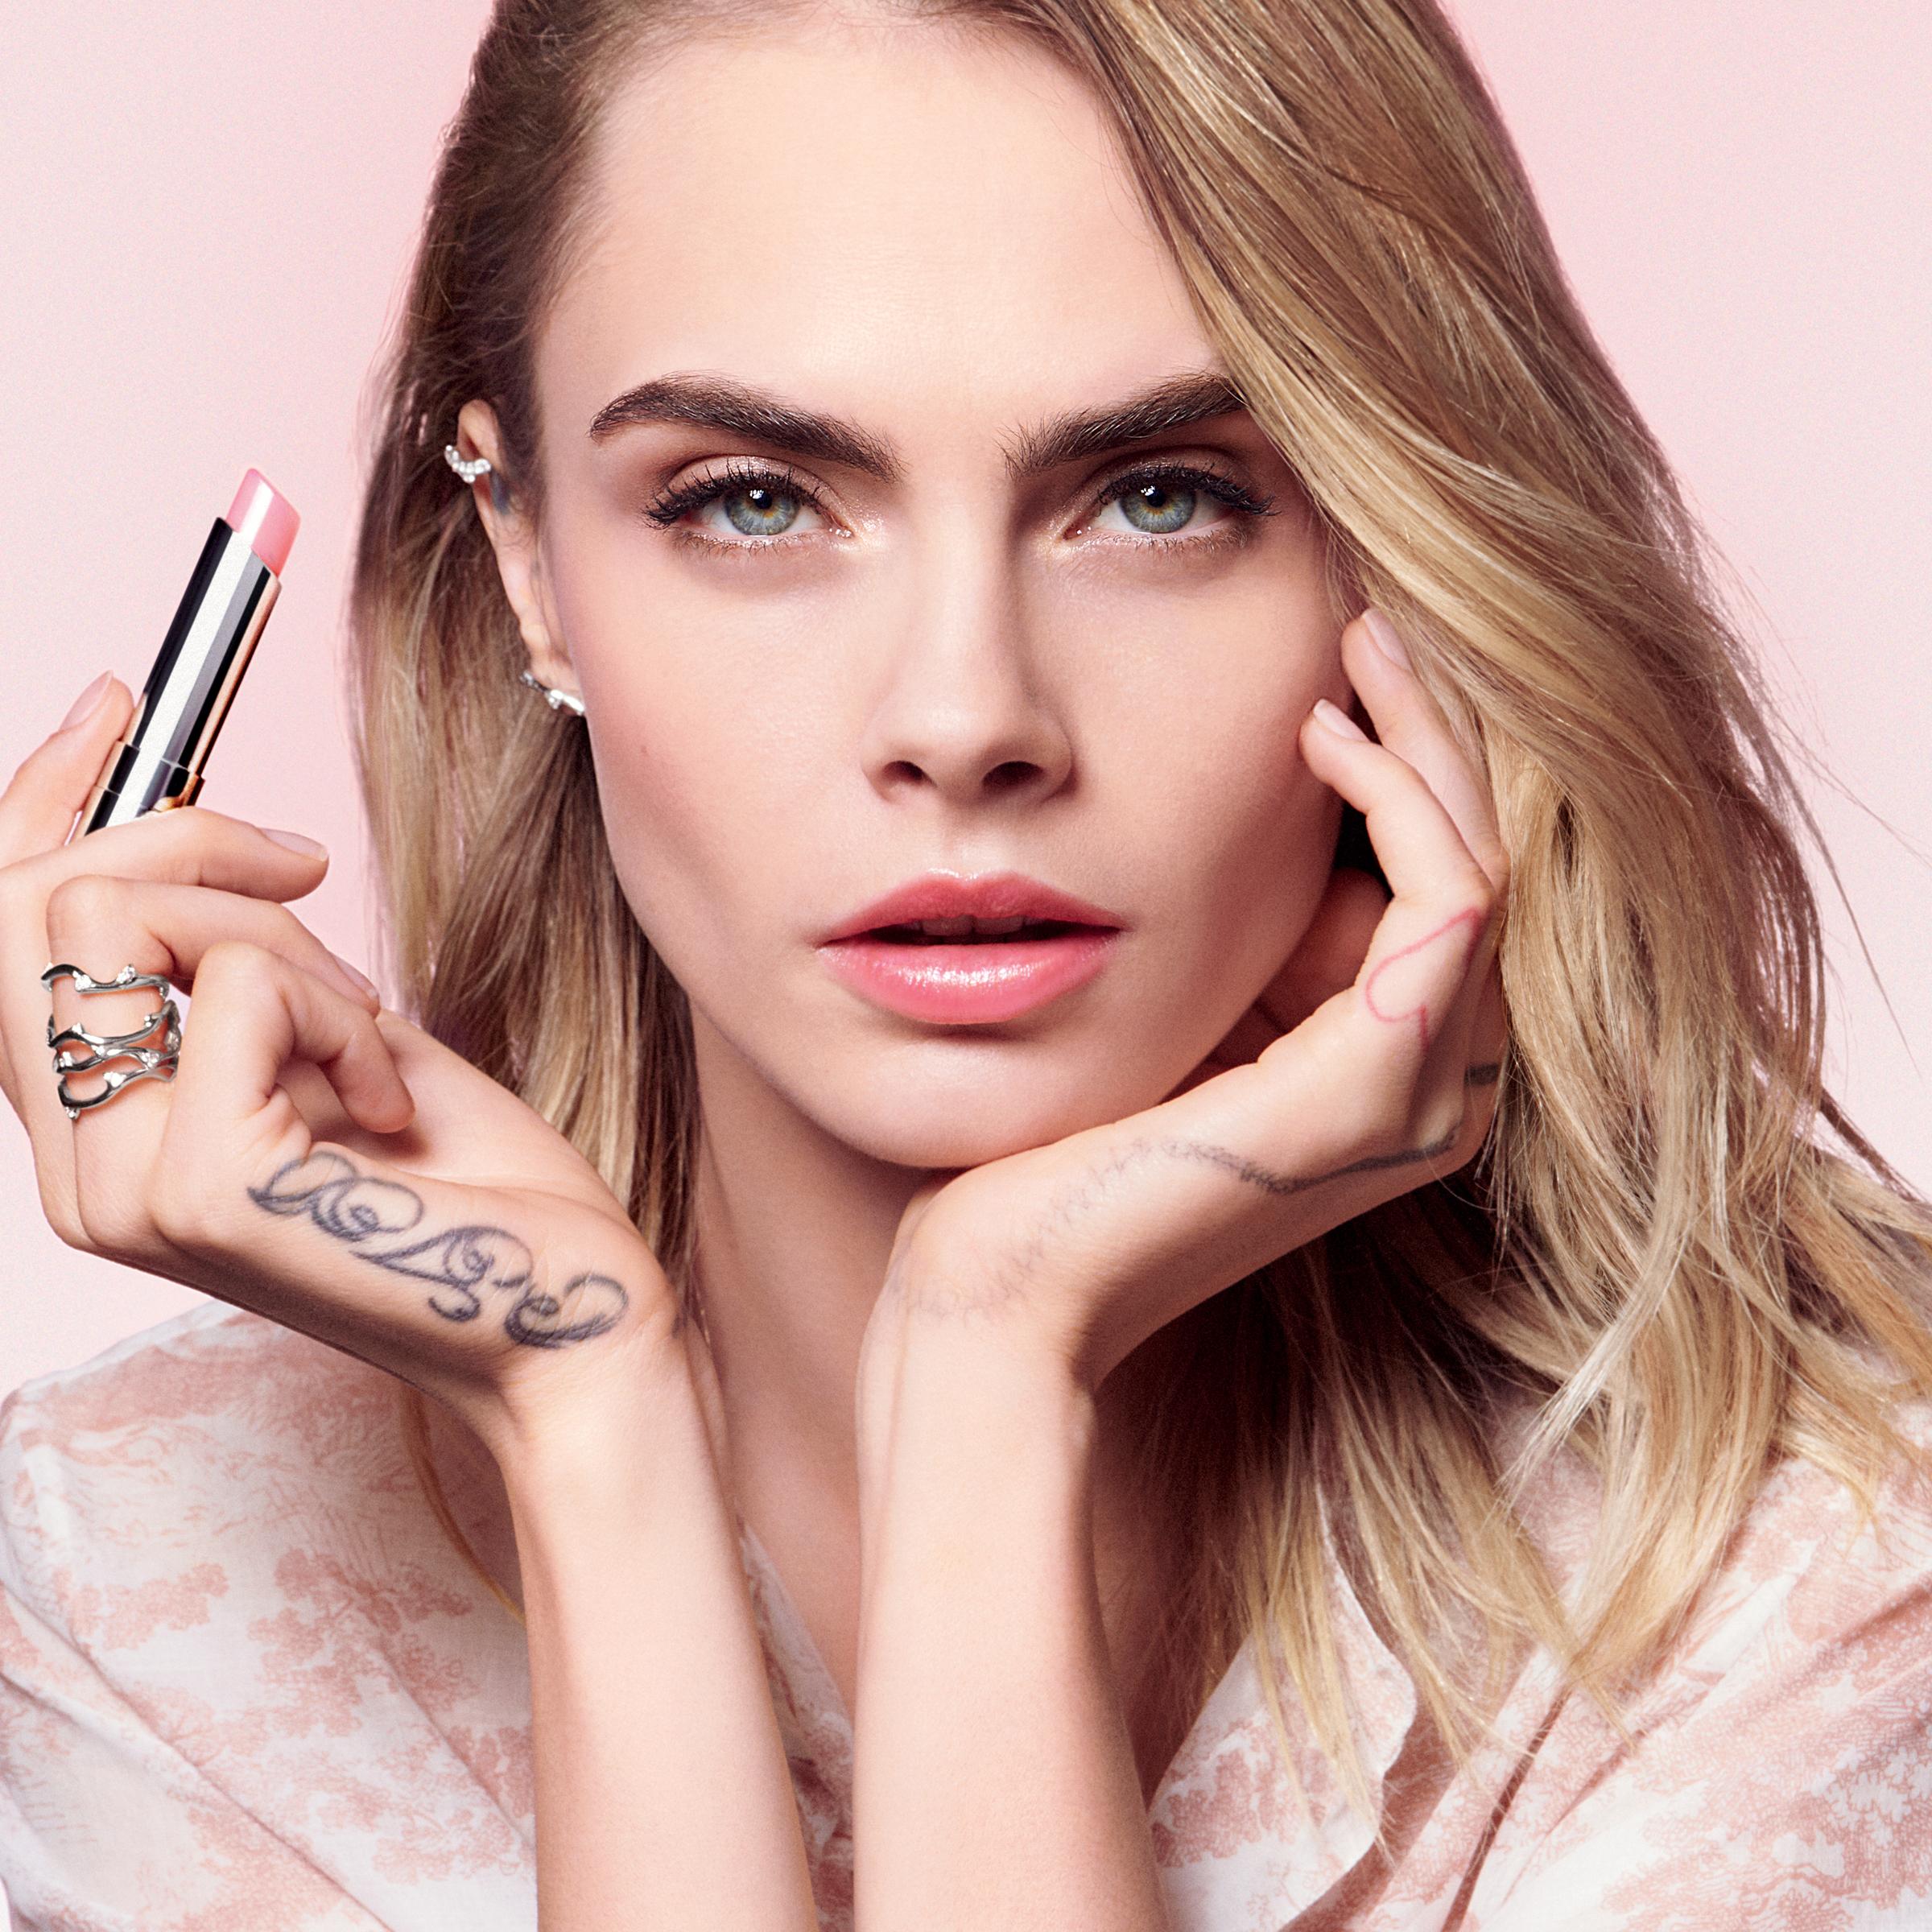 DIOR Addict Lip Glow Balm, 001 pink